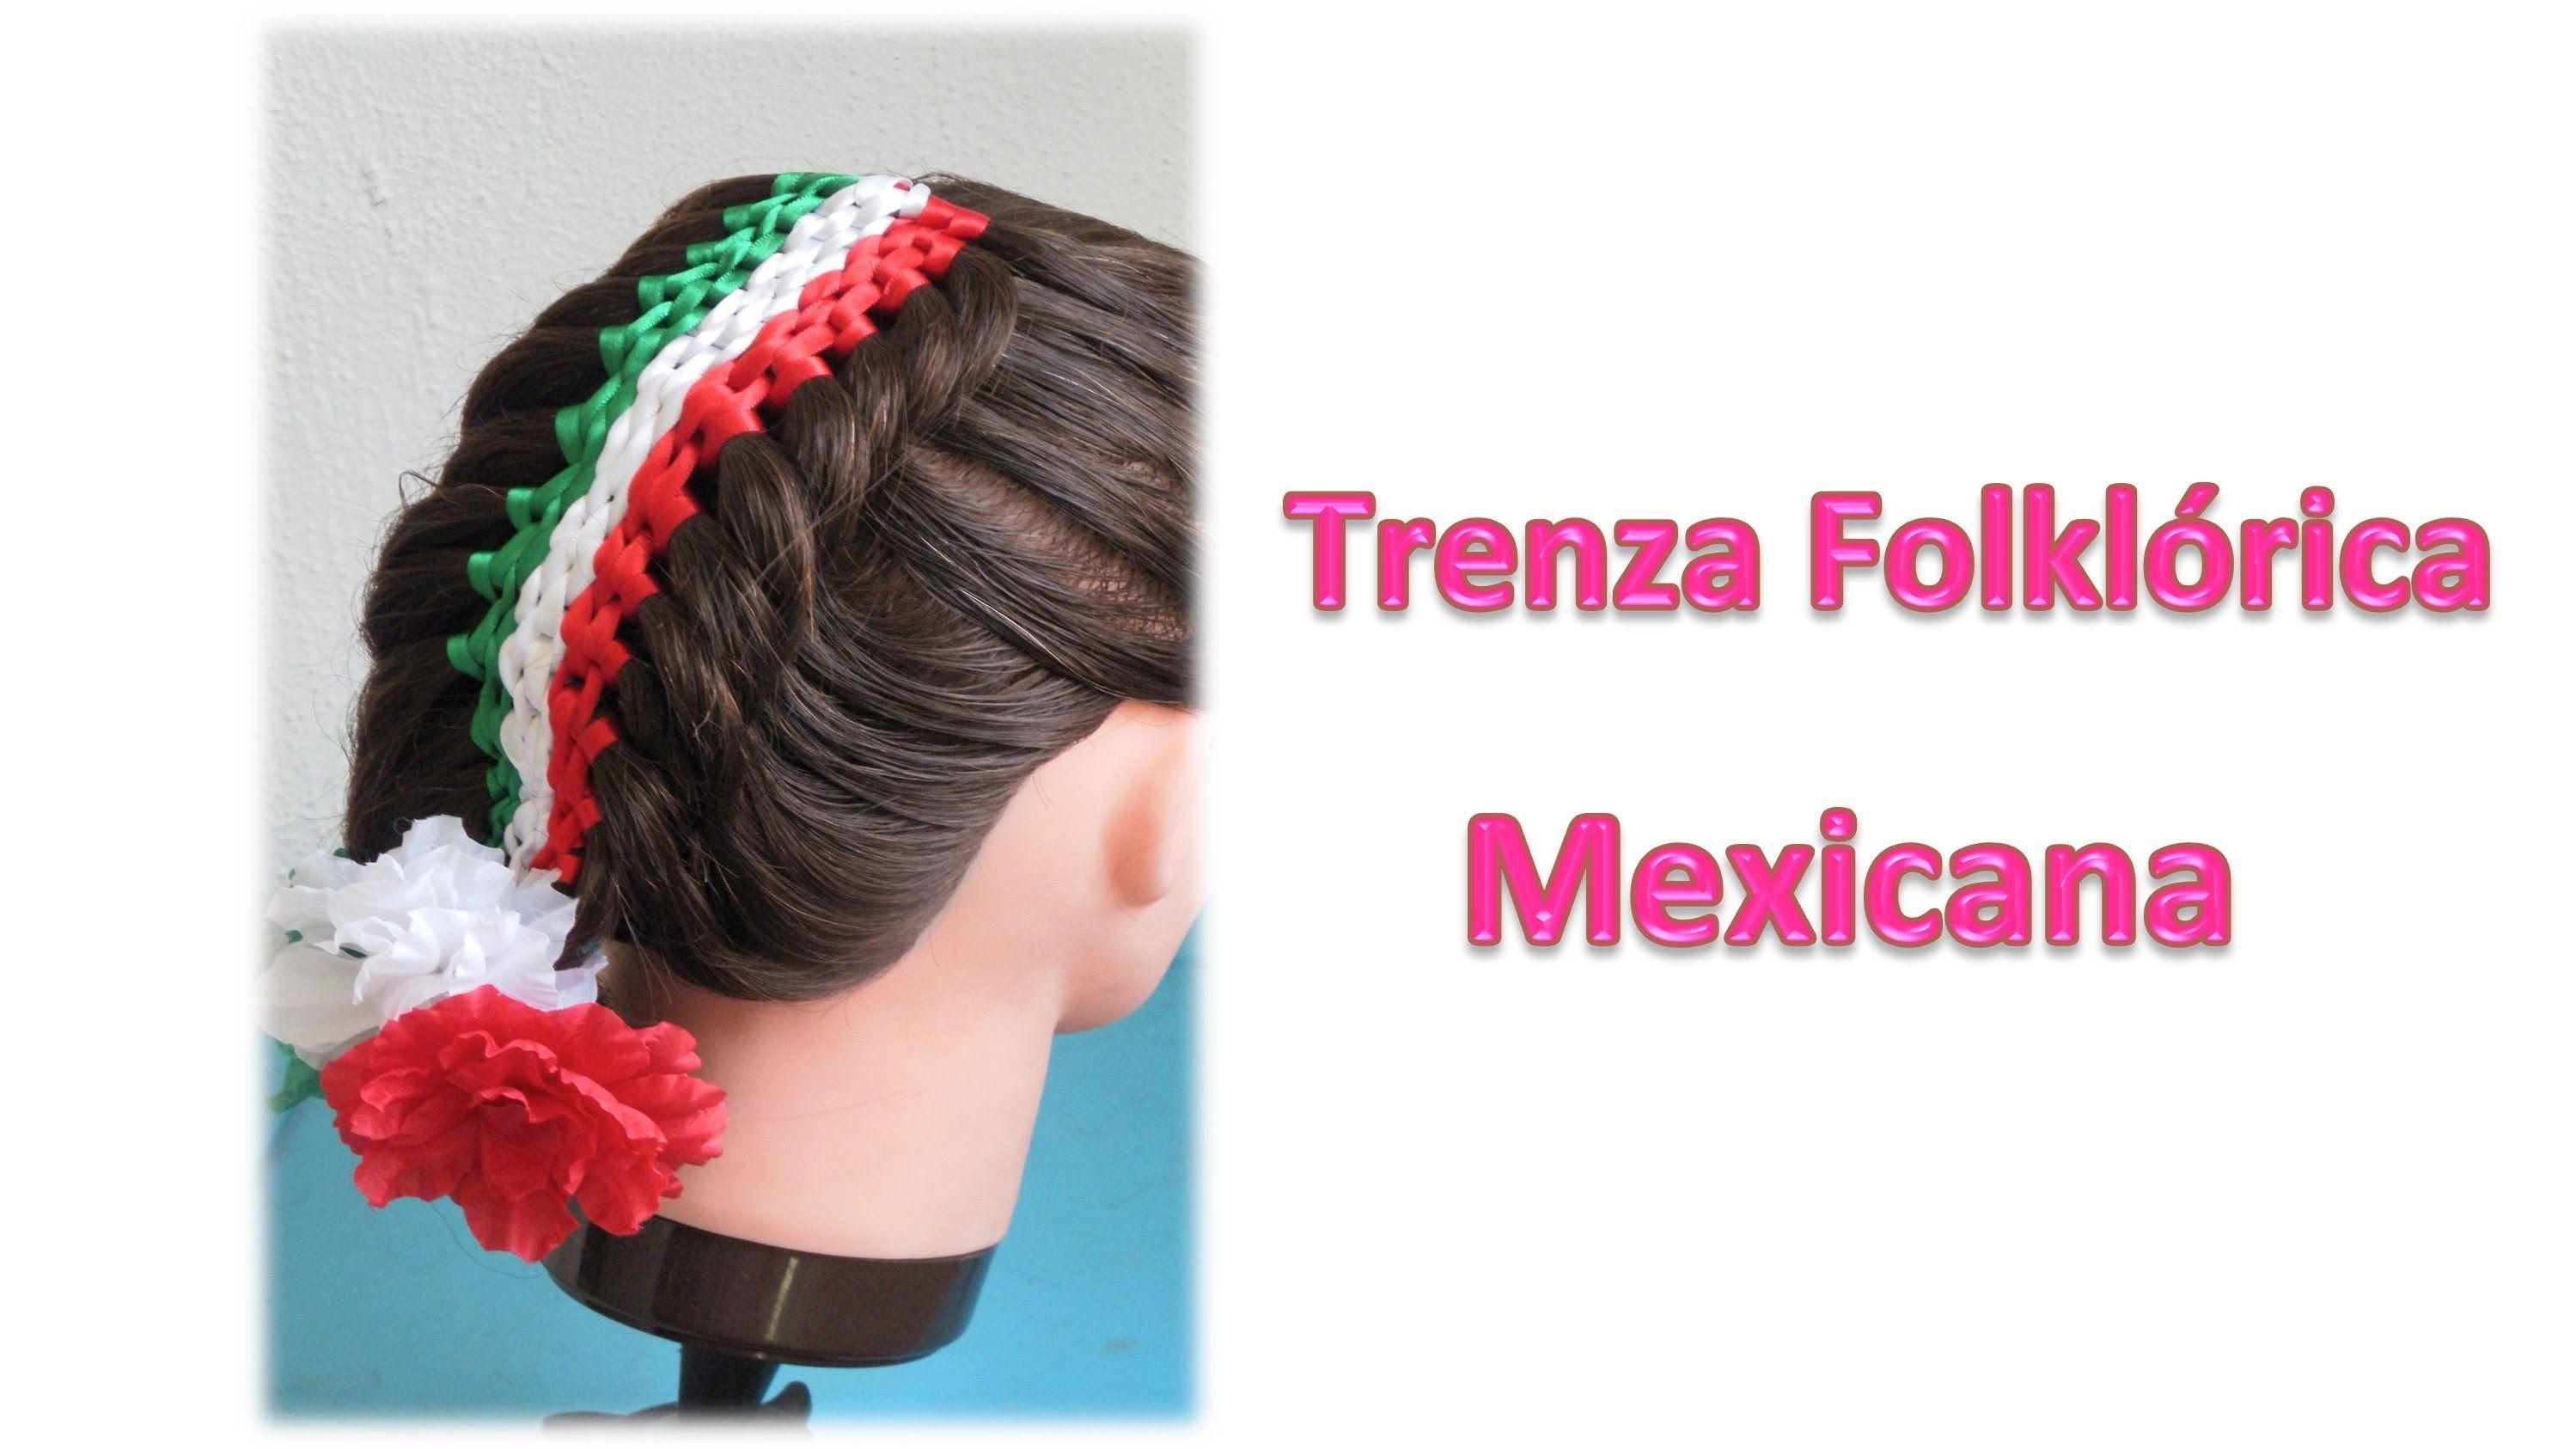 Trenza Folklorica Para Fiestas Patrias Mexico Peinados Con Trenzas Pei Peinados Con Trenzas Peinados Trenzas